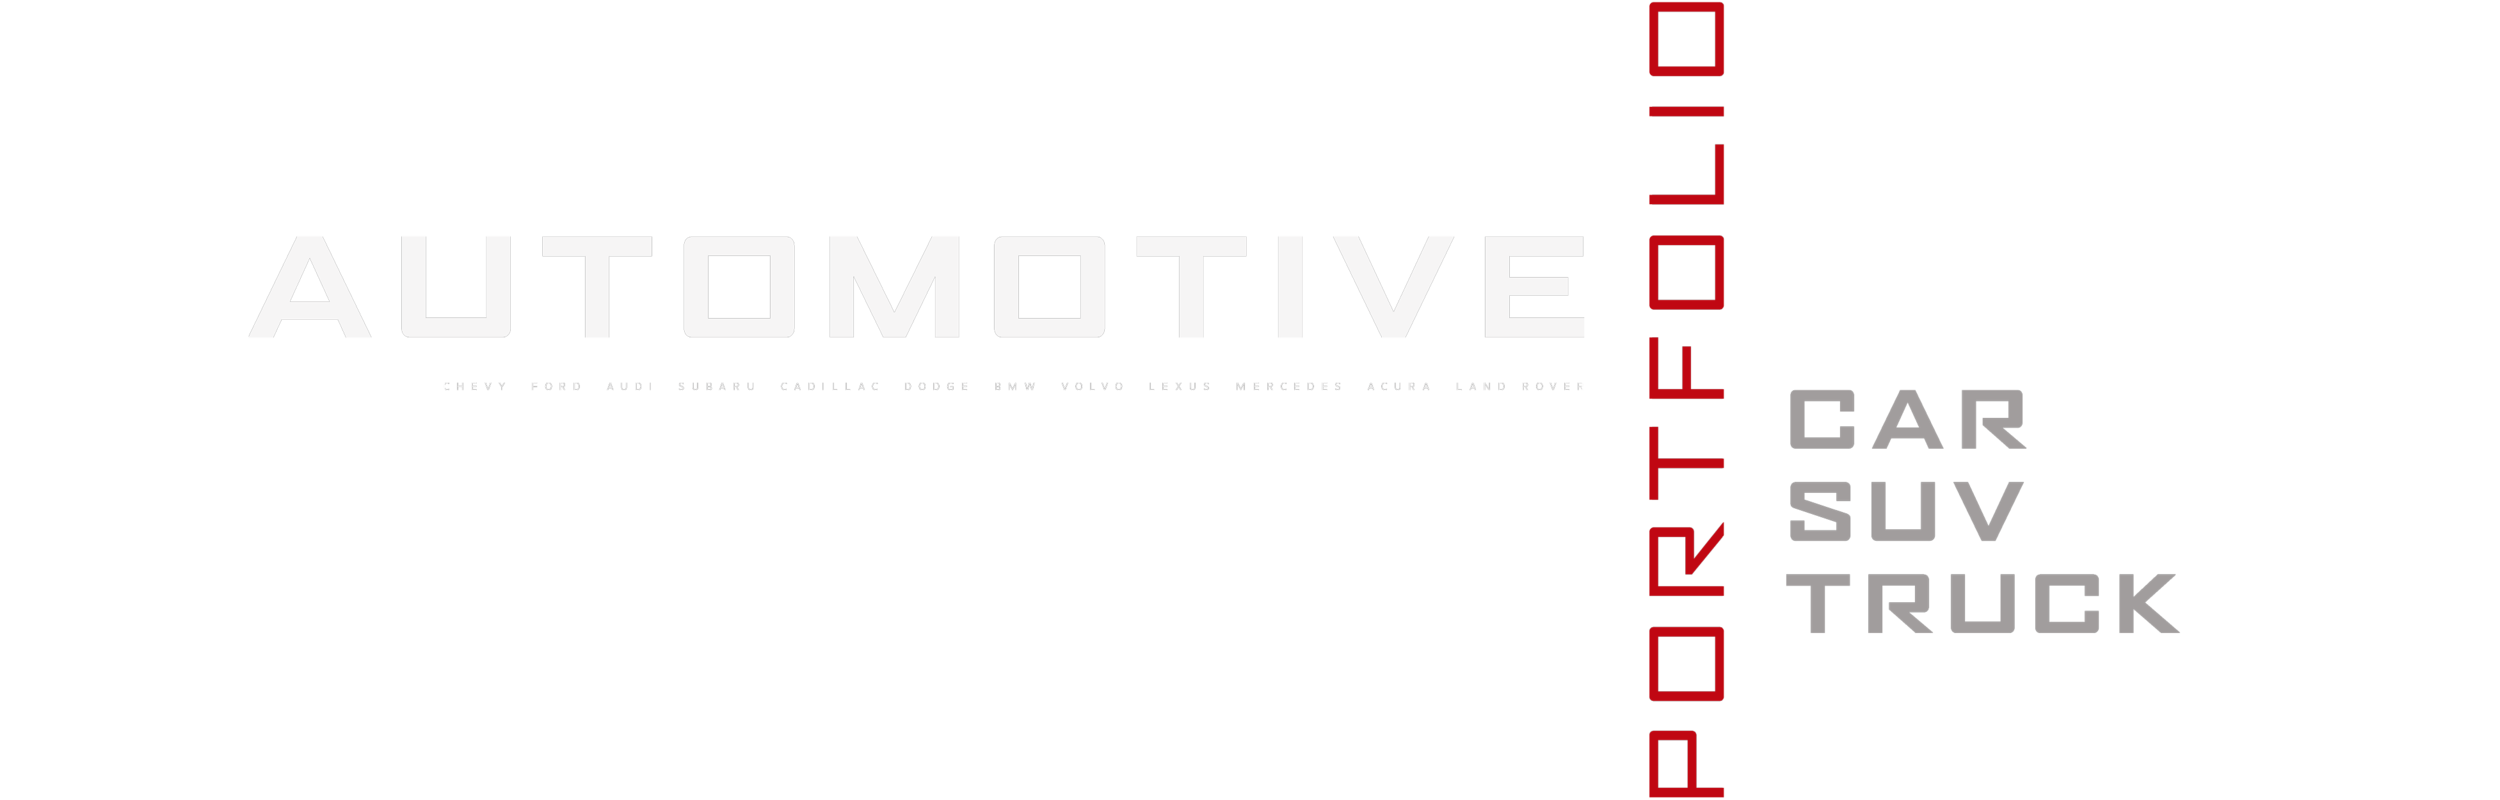 Portfolio-Titles-Auto-3.png